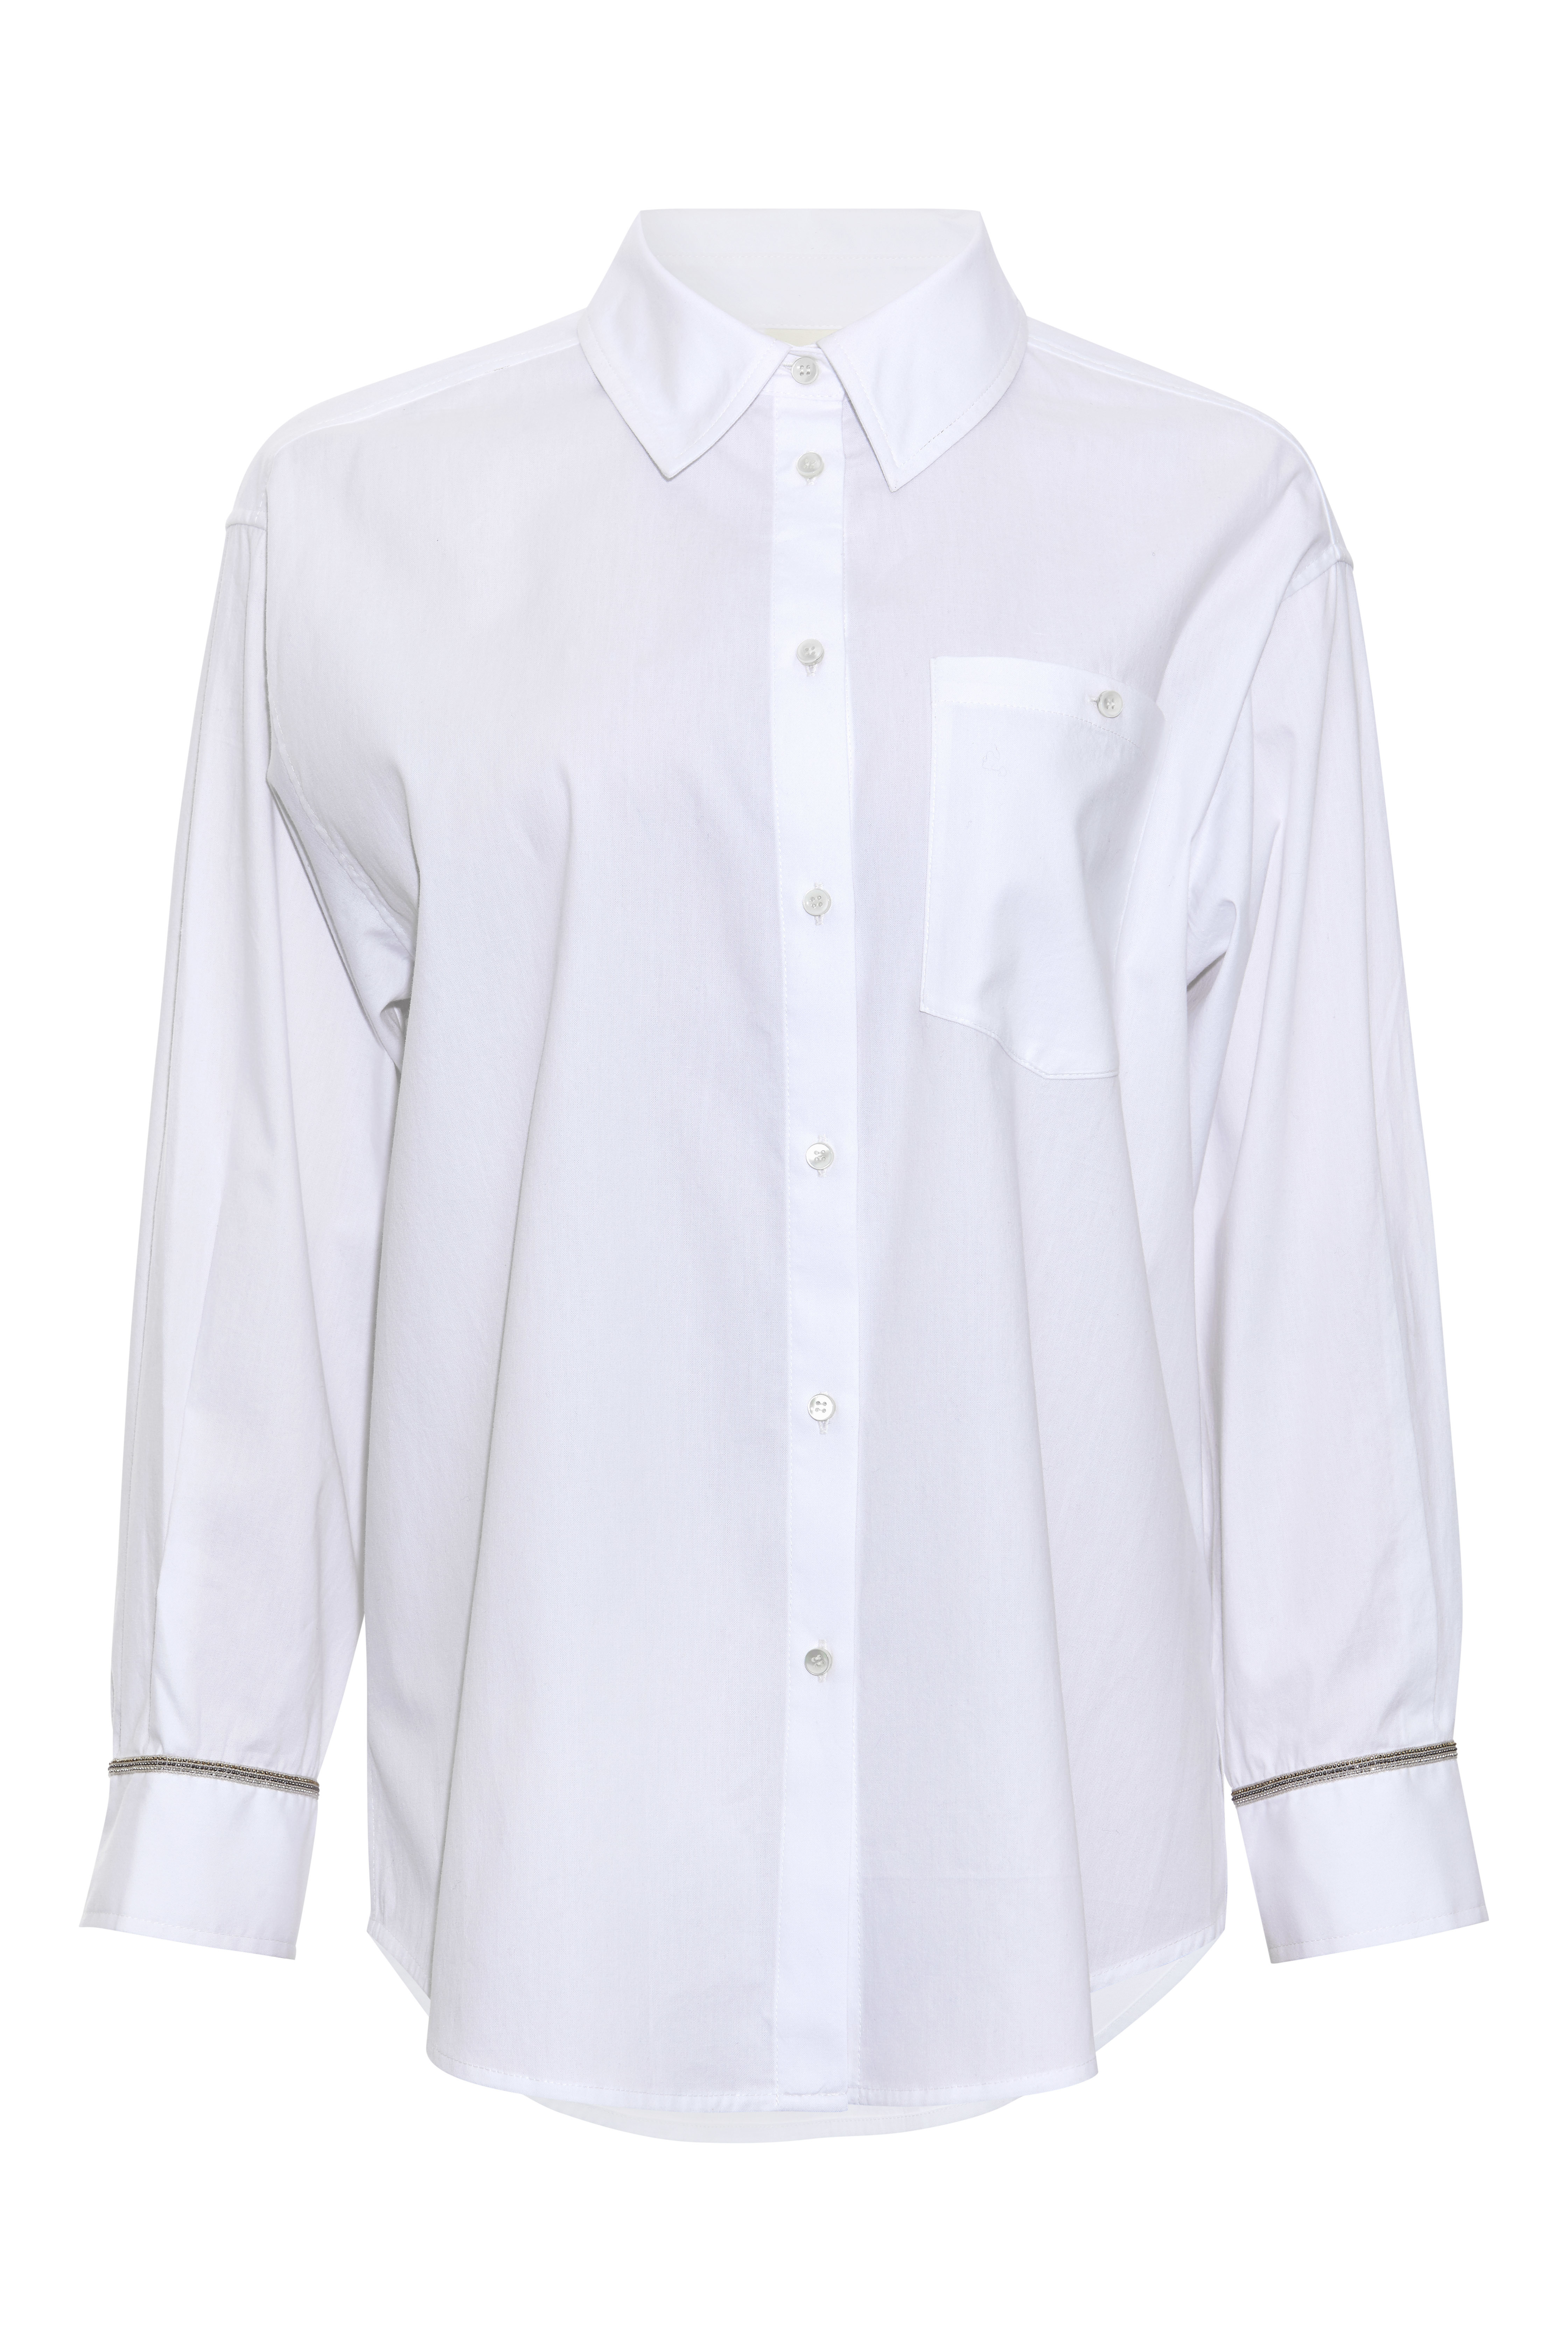 Heartmade Mekan Skjorte, Off White, 42